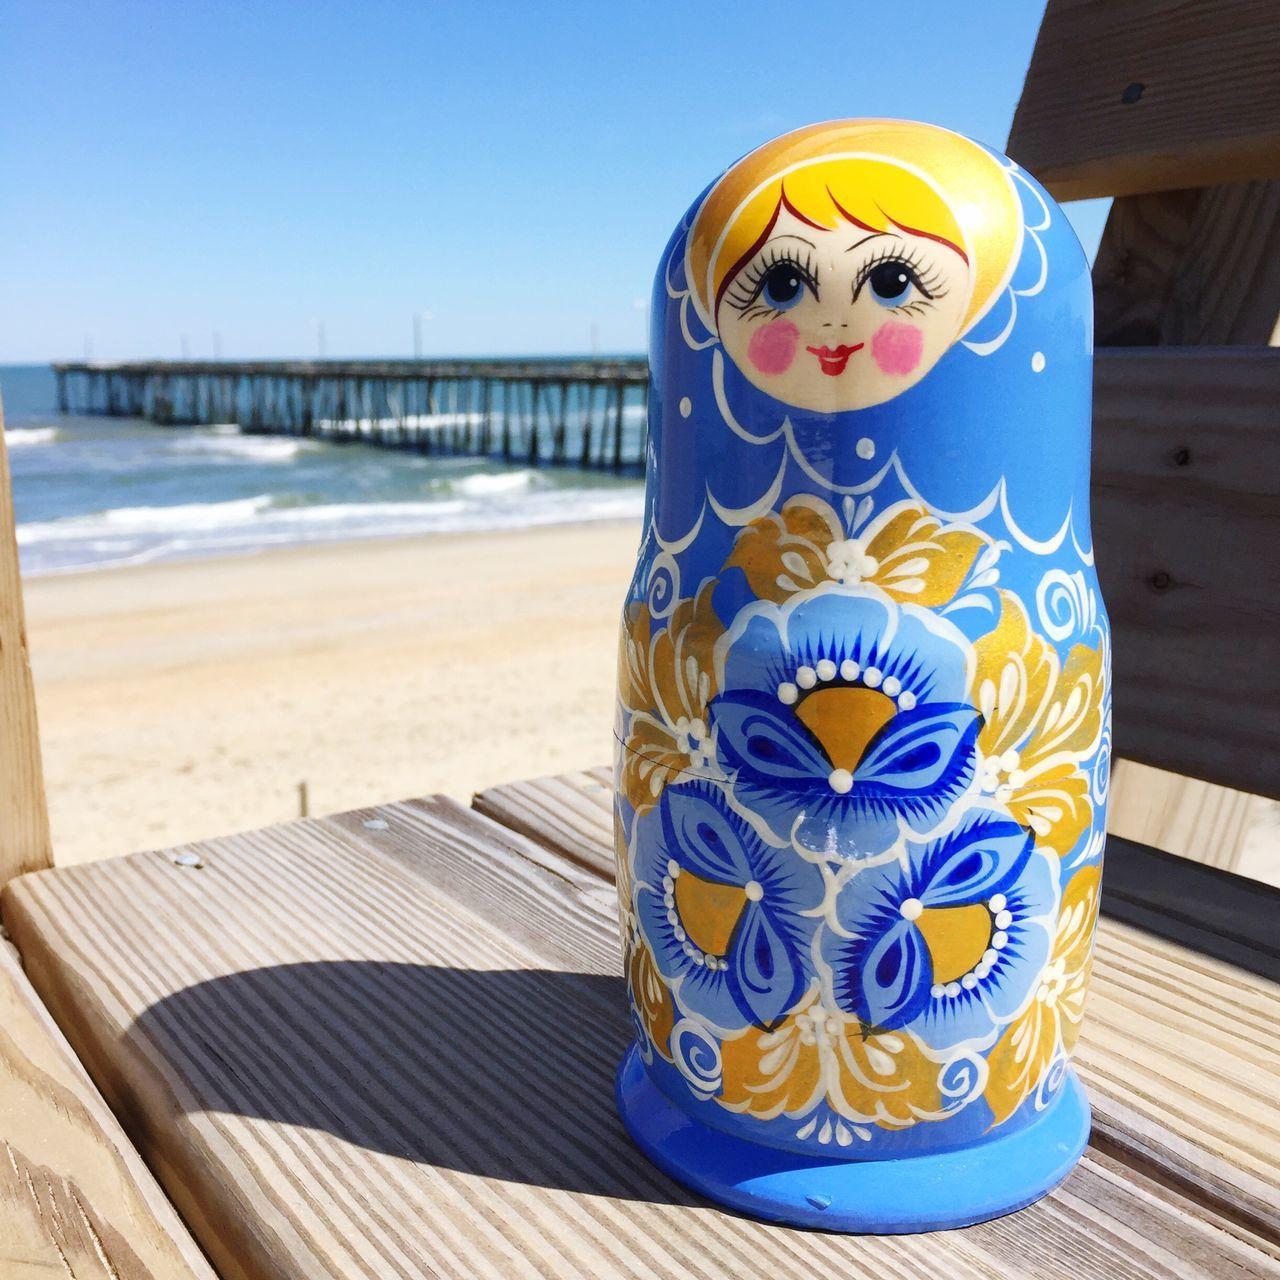 Matryoshka Doll On Bench At Beach Against Clear Blue Sky